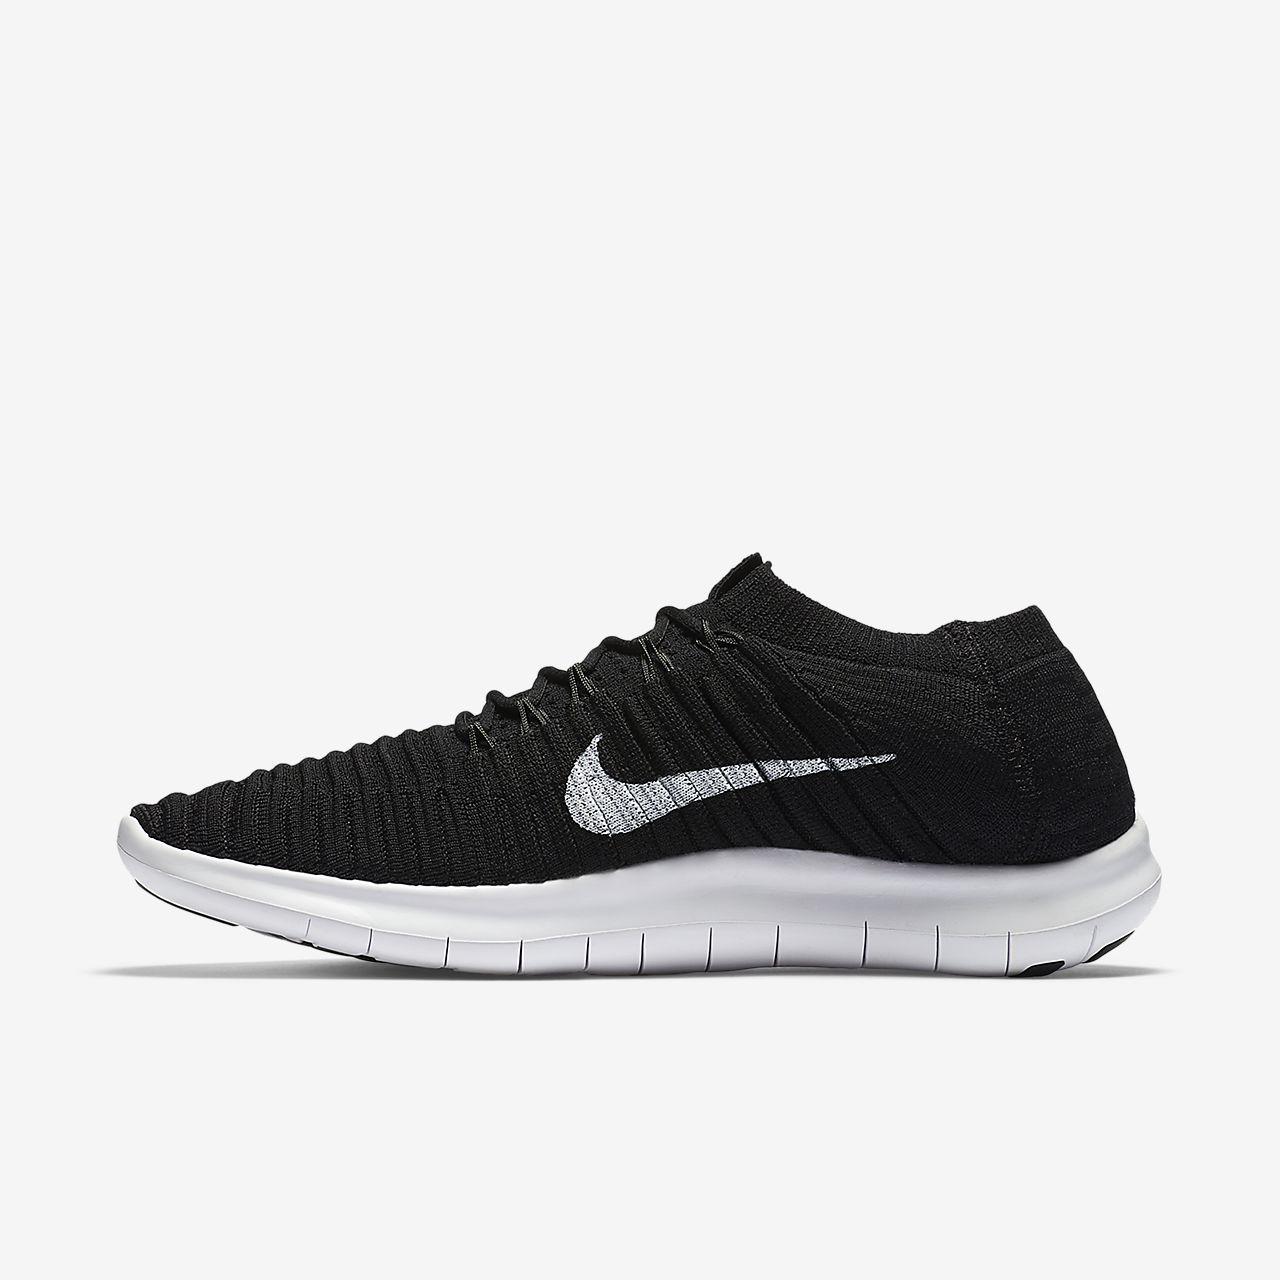 Nike Free Run Flyknit Chaussures Des Femmes